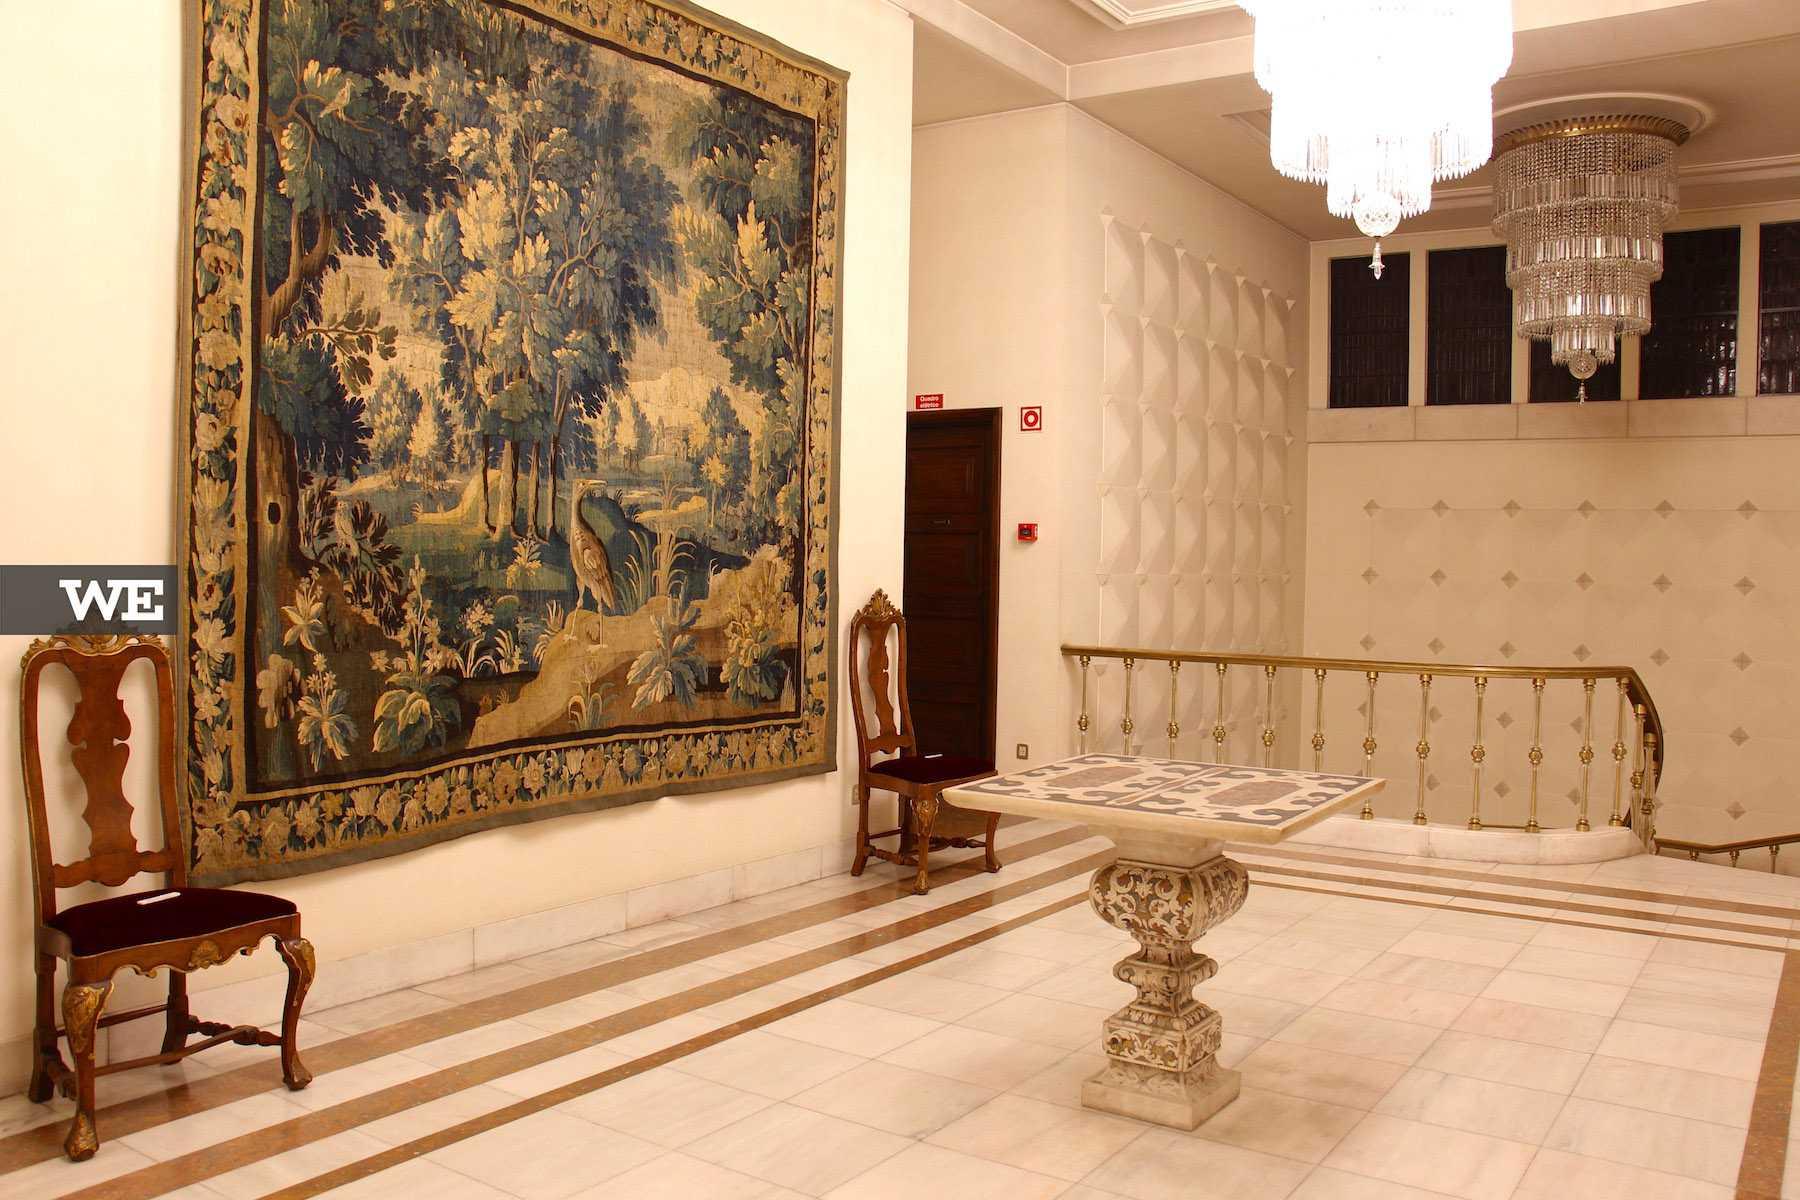 Museu Nogueira da Silva - Braga